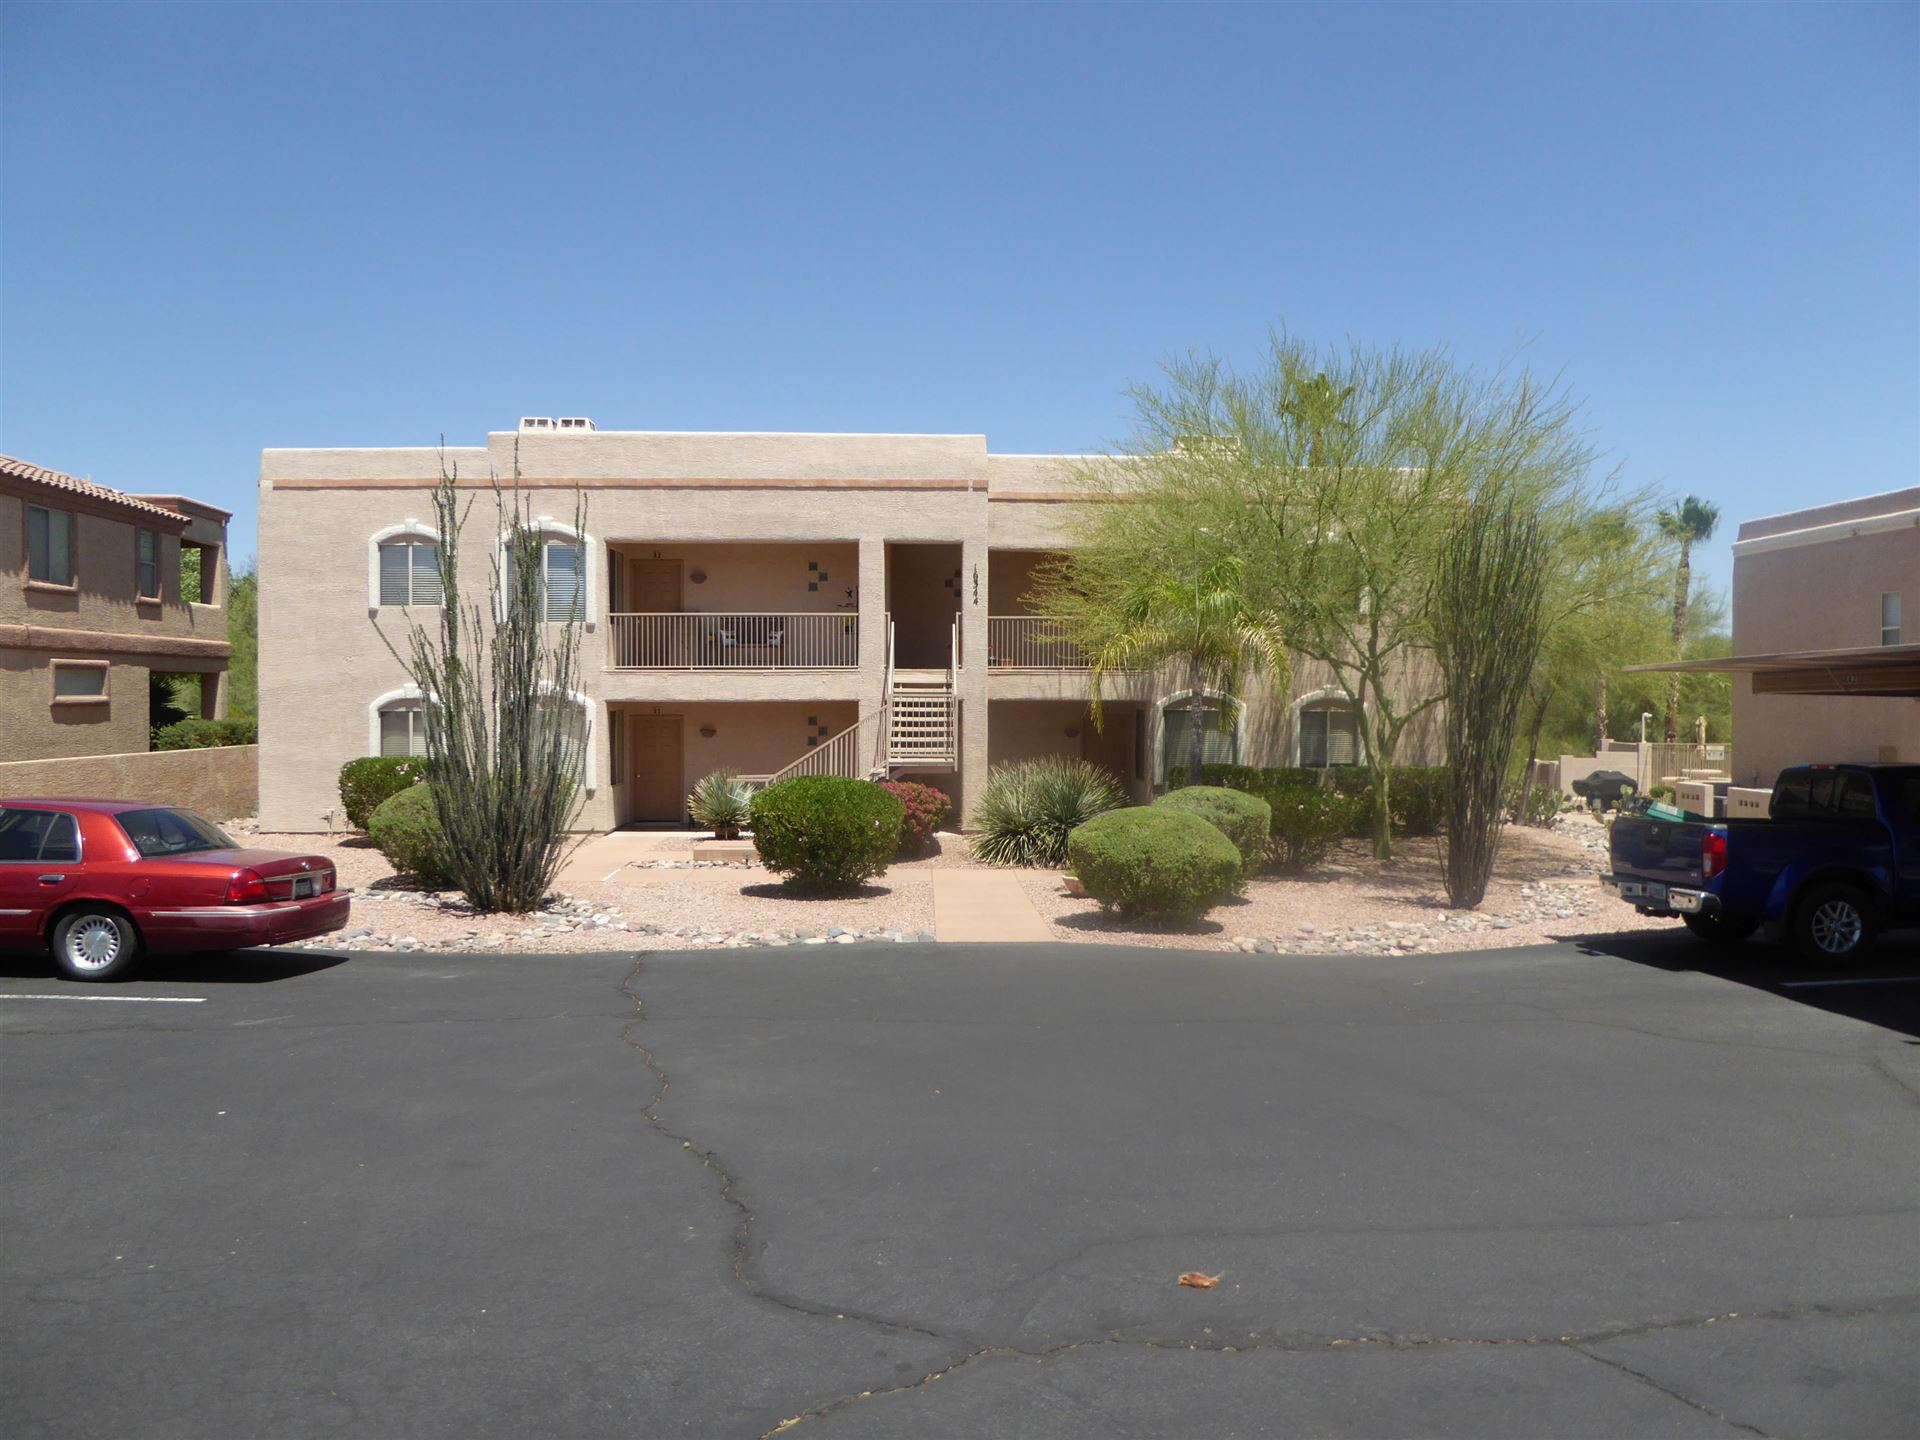 Photo of 16344 E ARROW Drive #B2, Fountain Hills, AZ 85268 (MLS # 6234164)